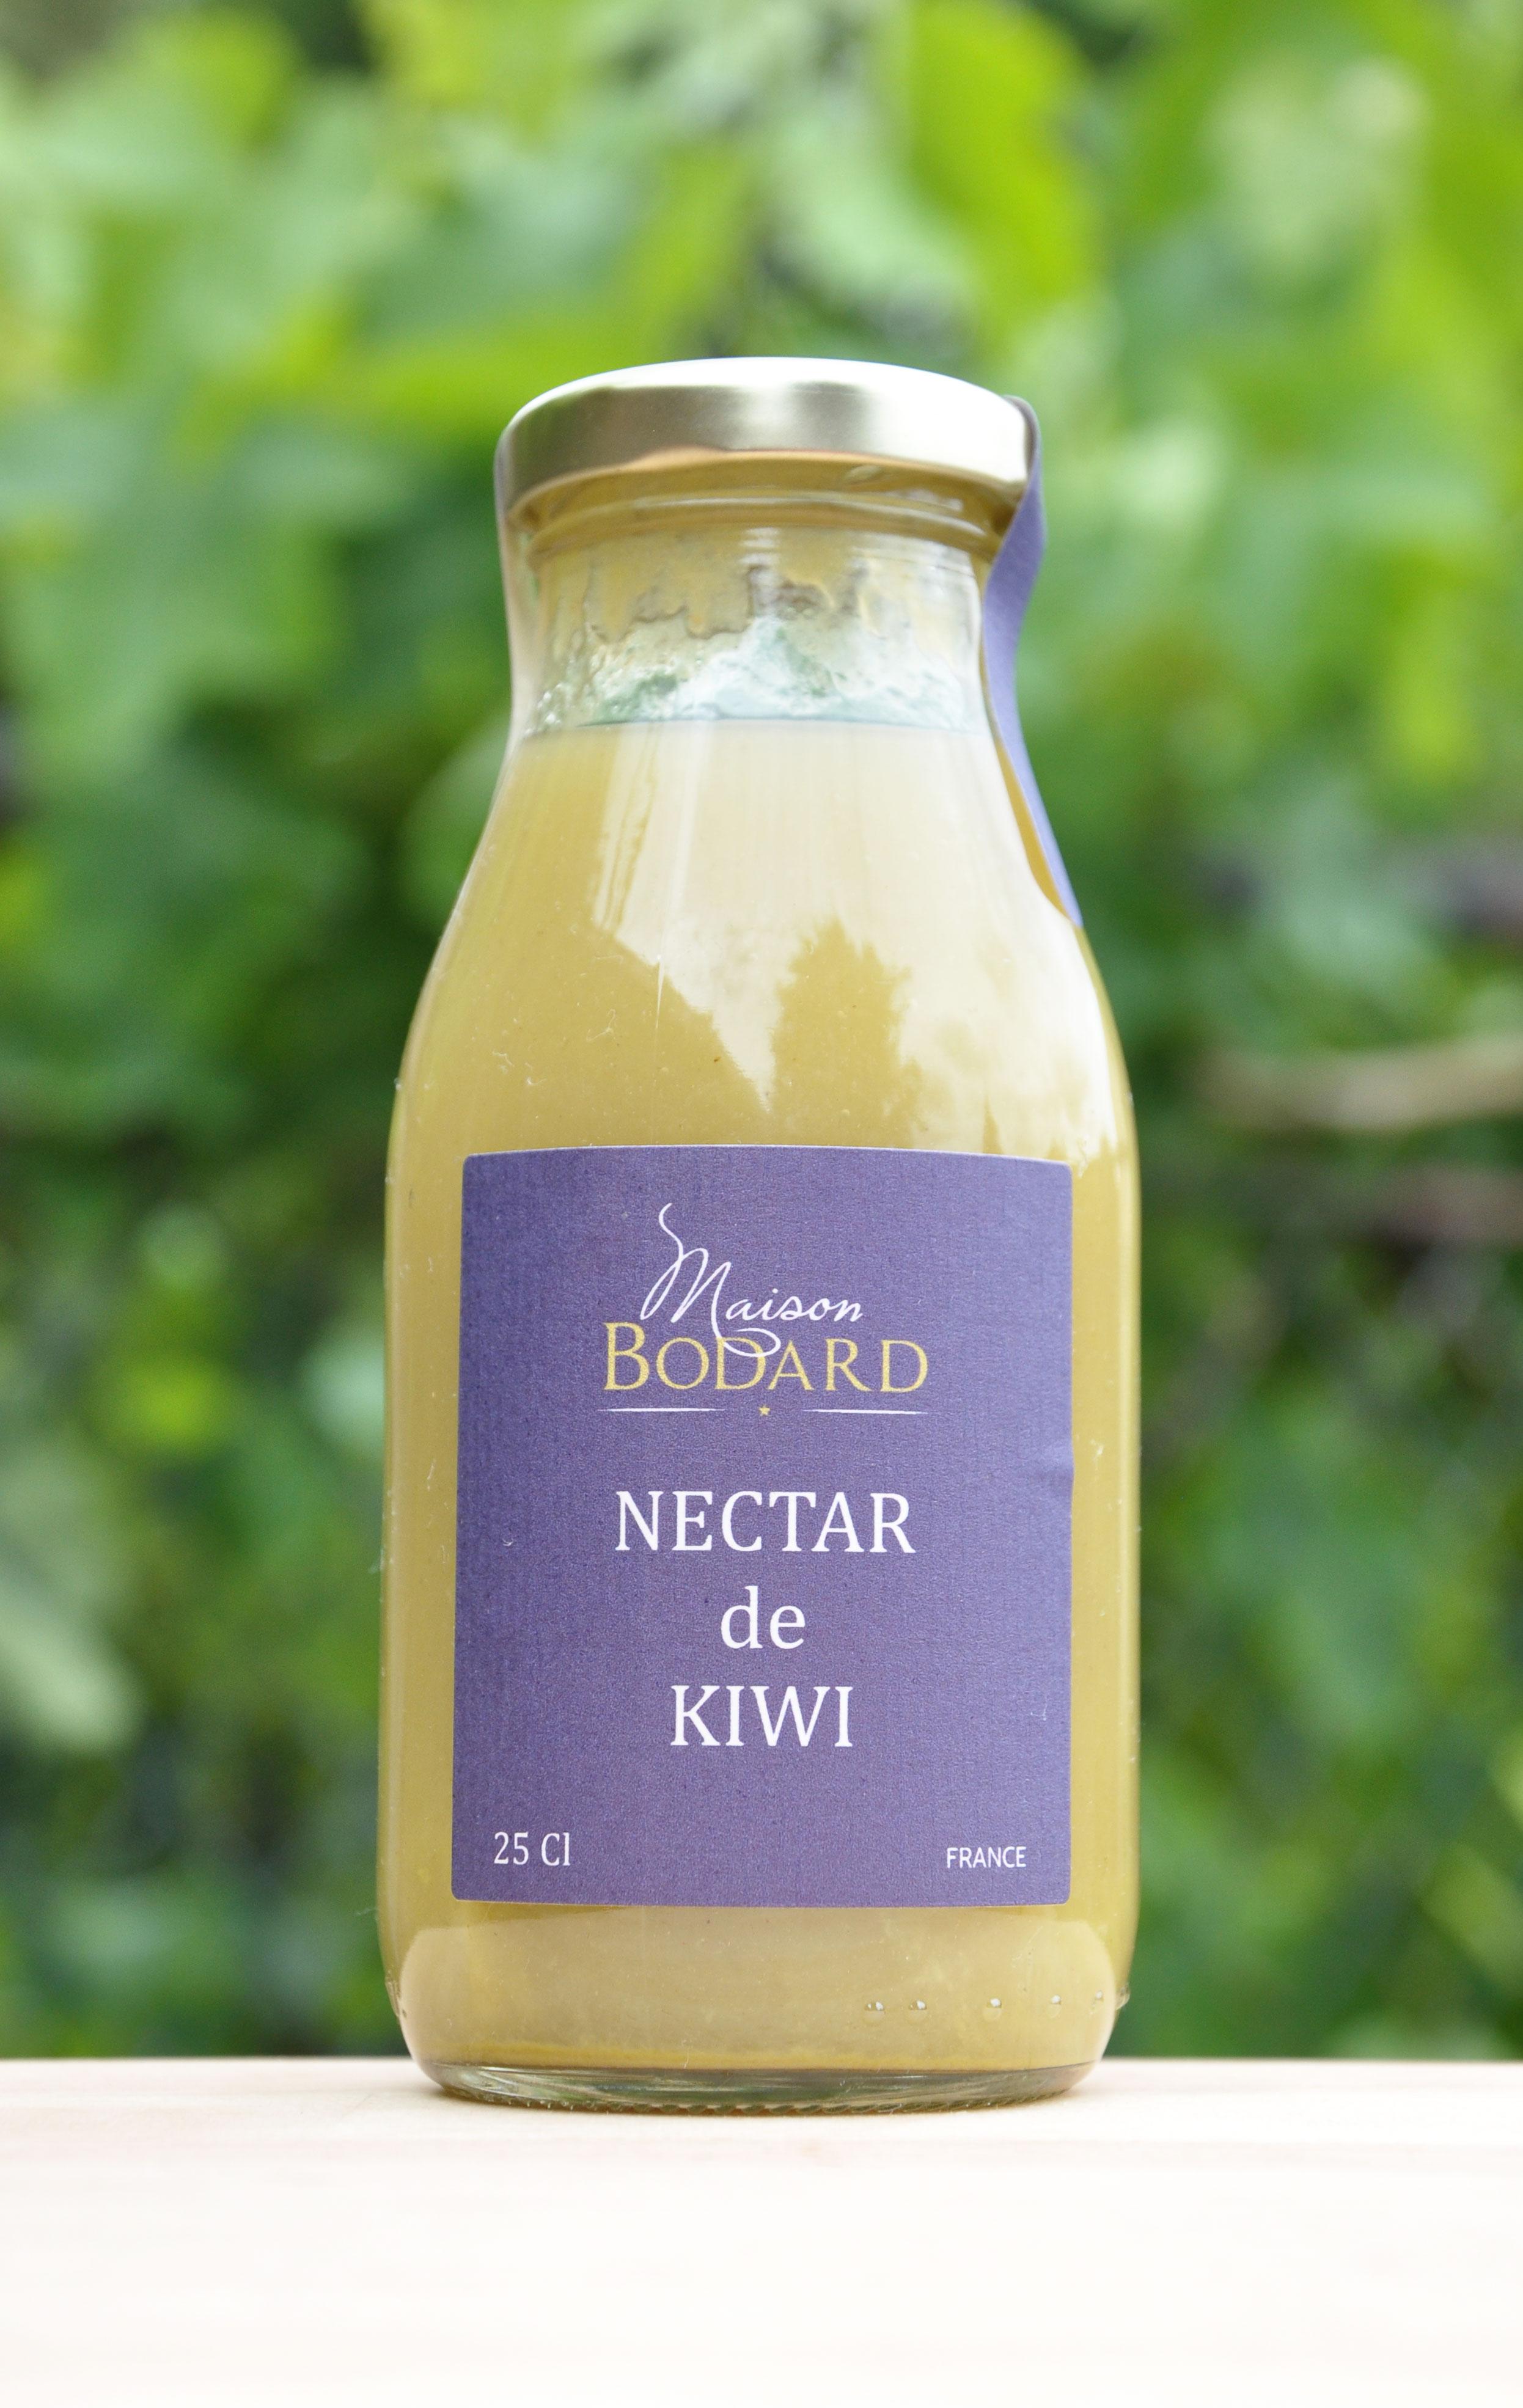 nectar-kiwi-haut-gamme (2)